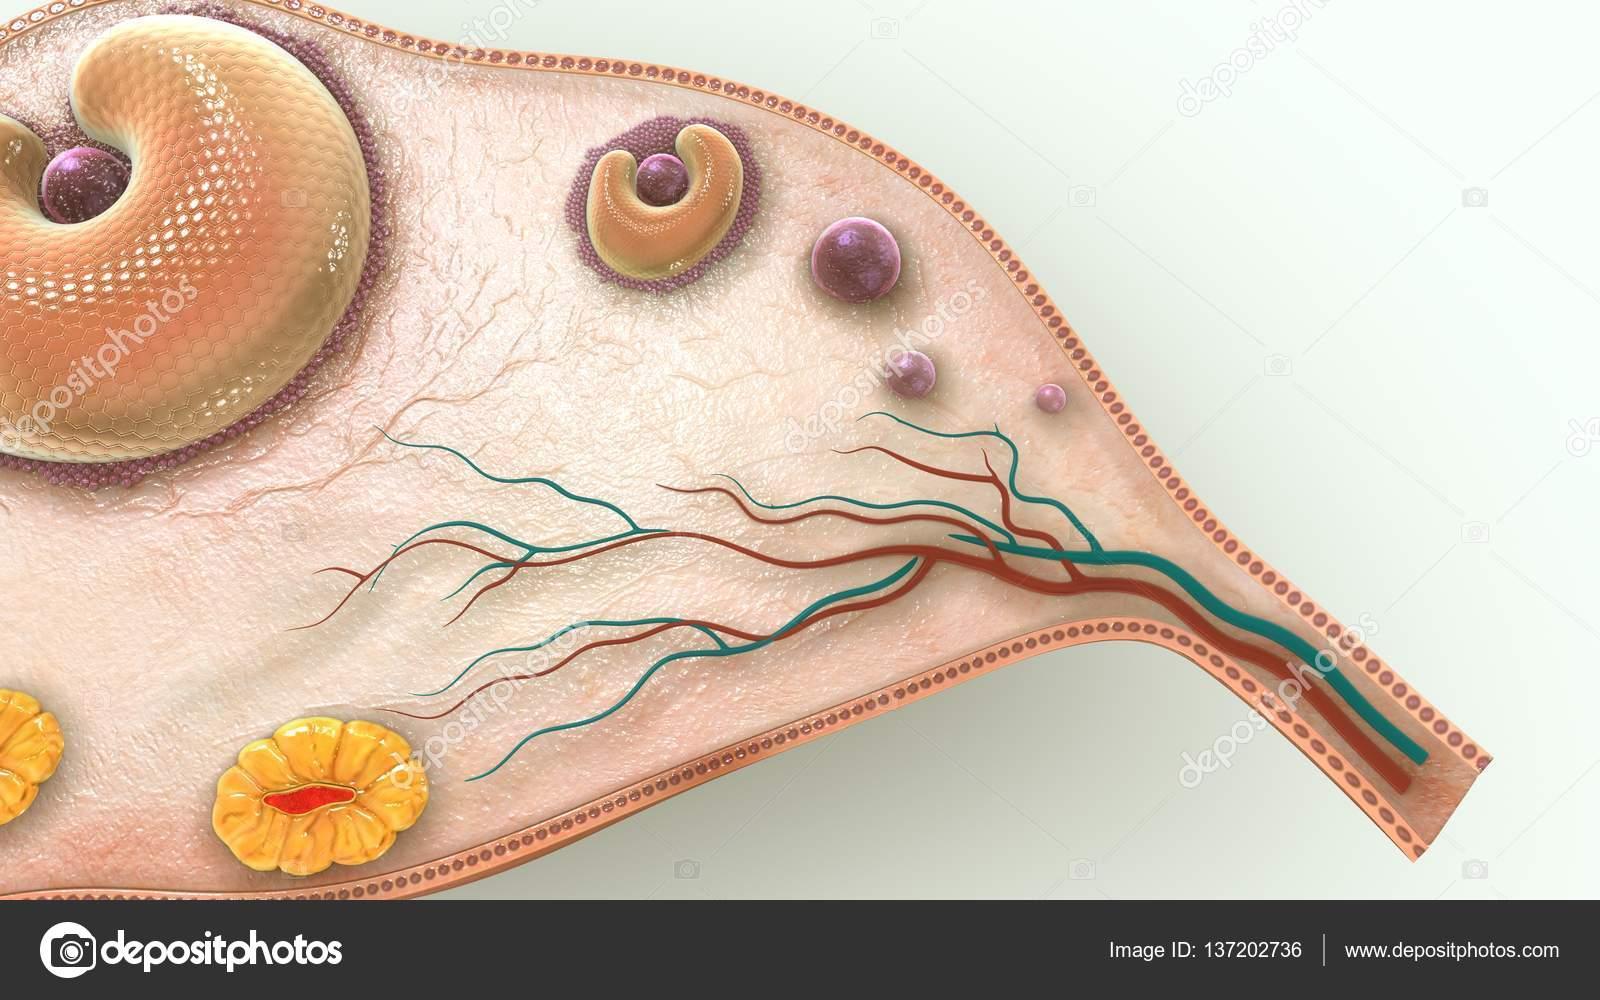 Eierstock 3D-Illustration — Stockfoto © sciencepics #137202736